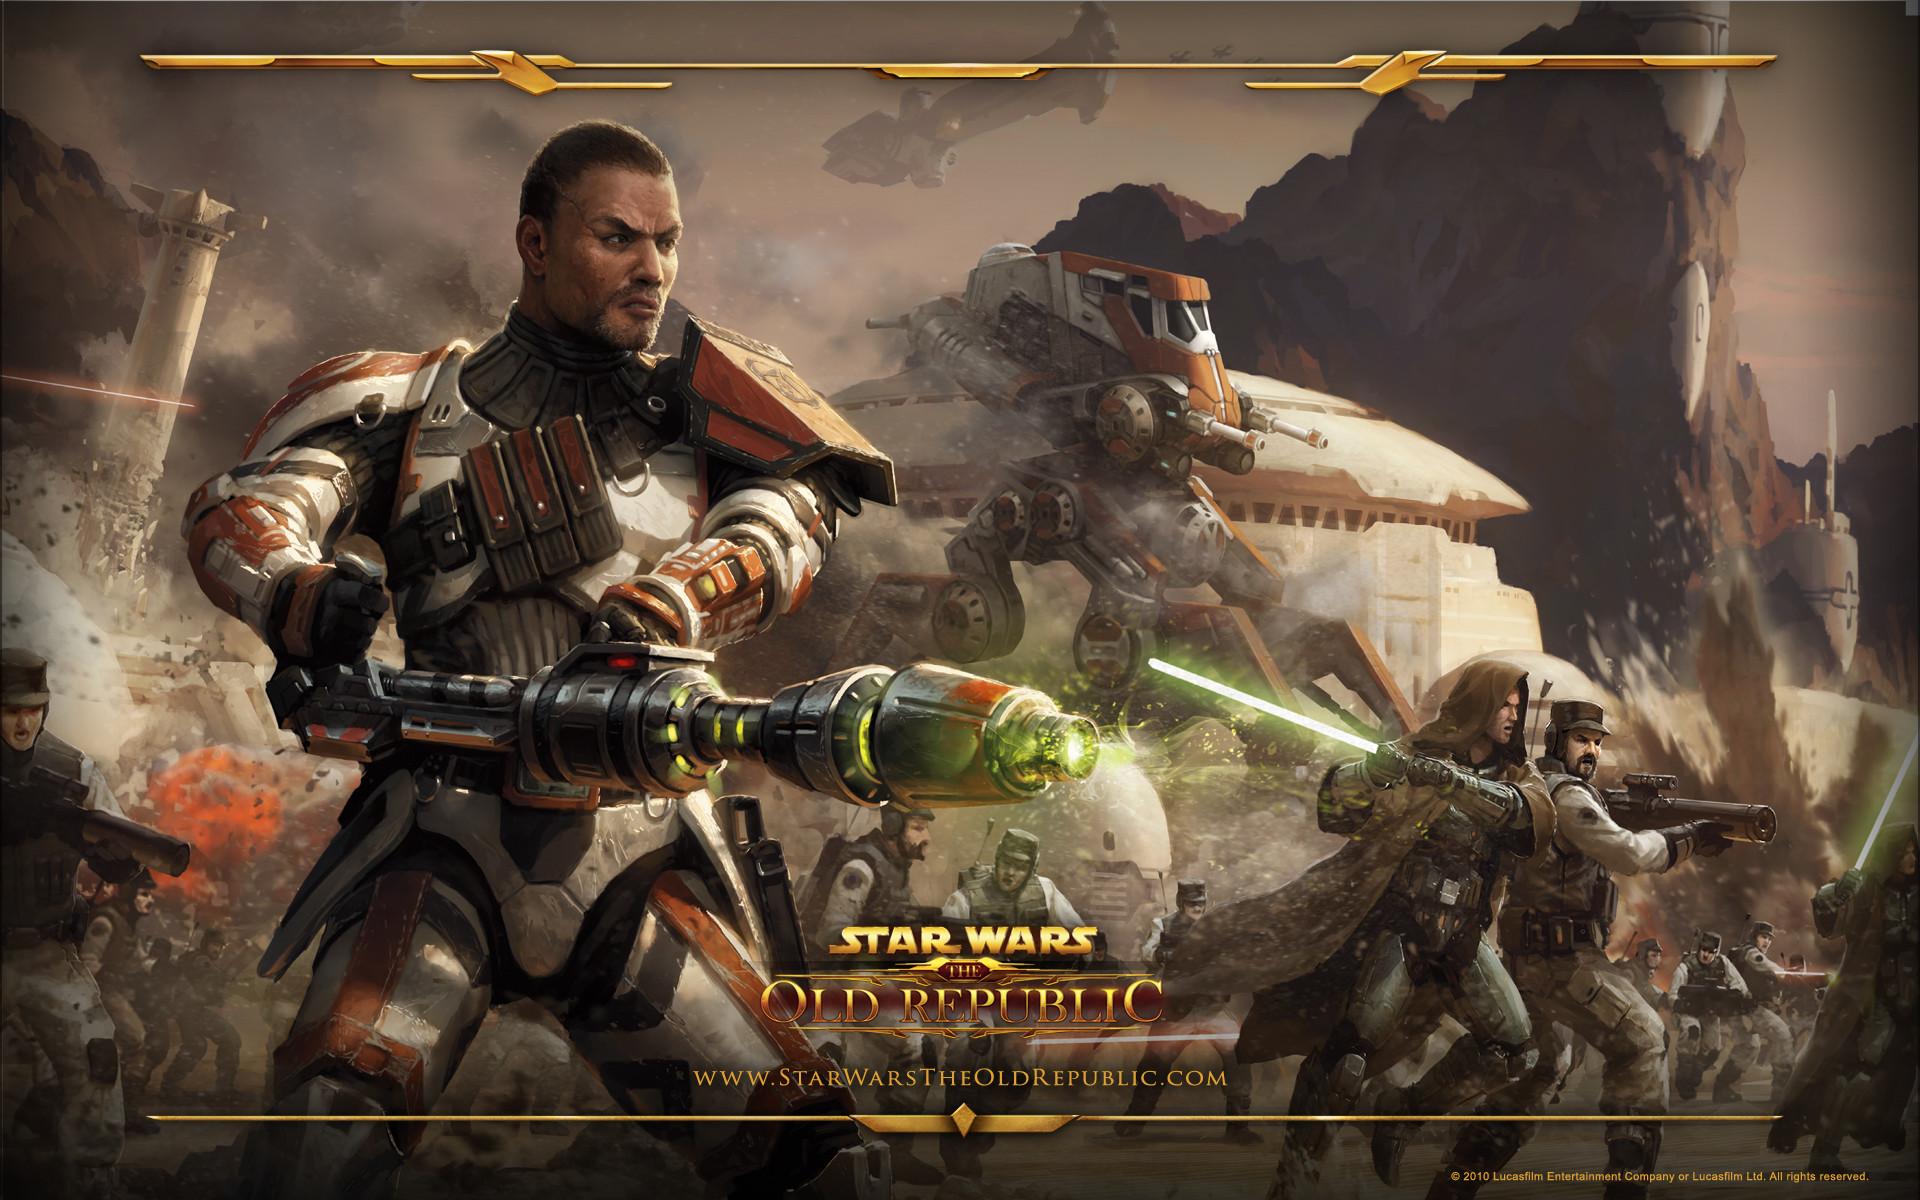 Star Wars Kotor Wallpaper (62+ images)